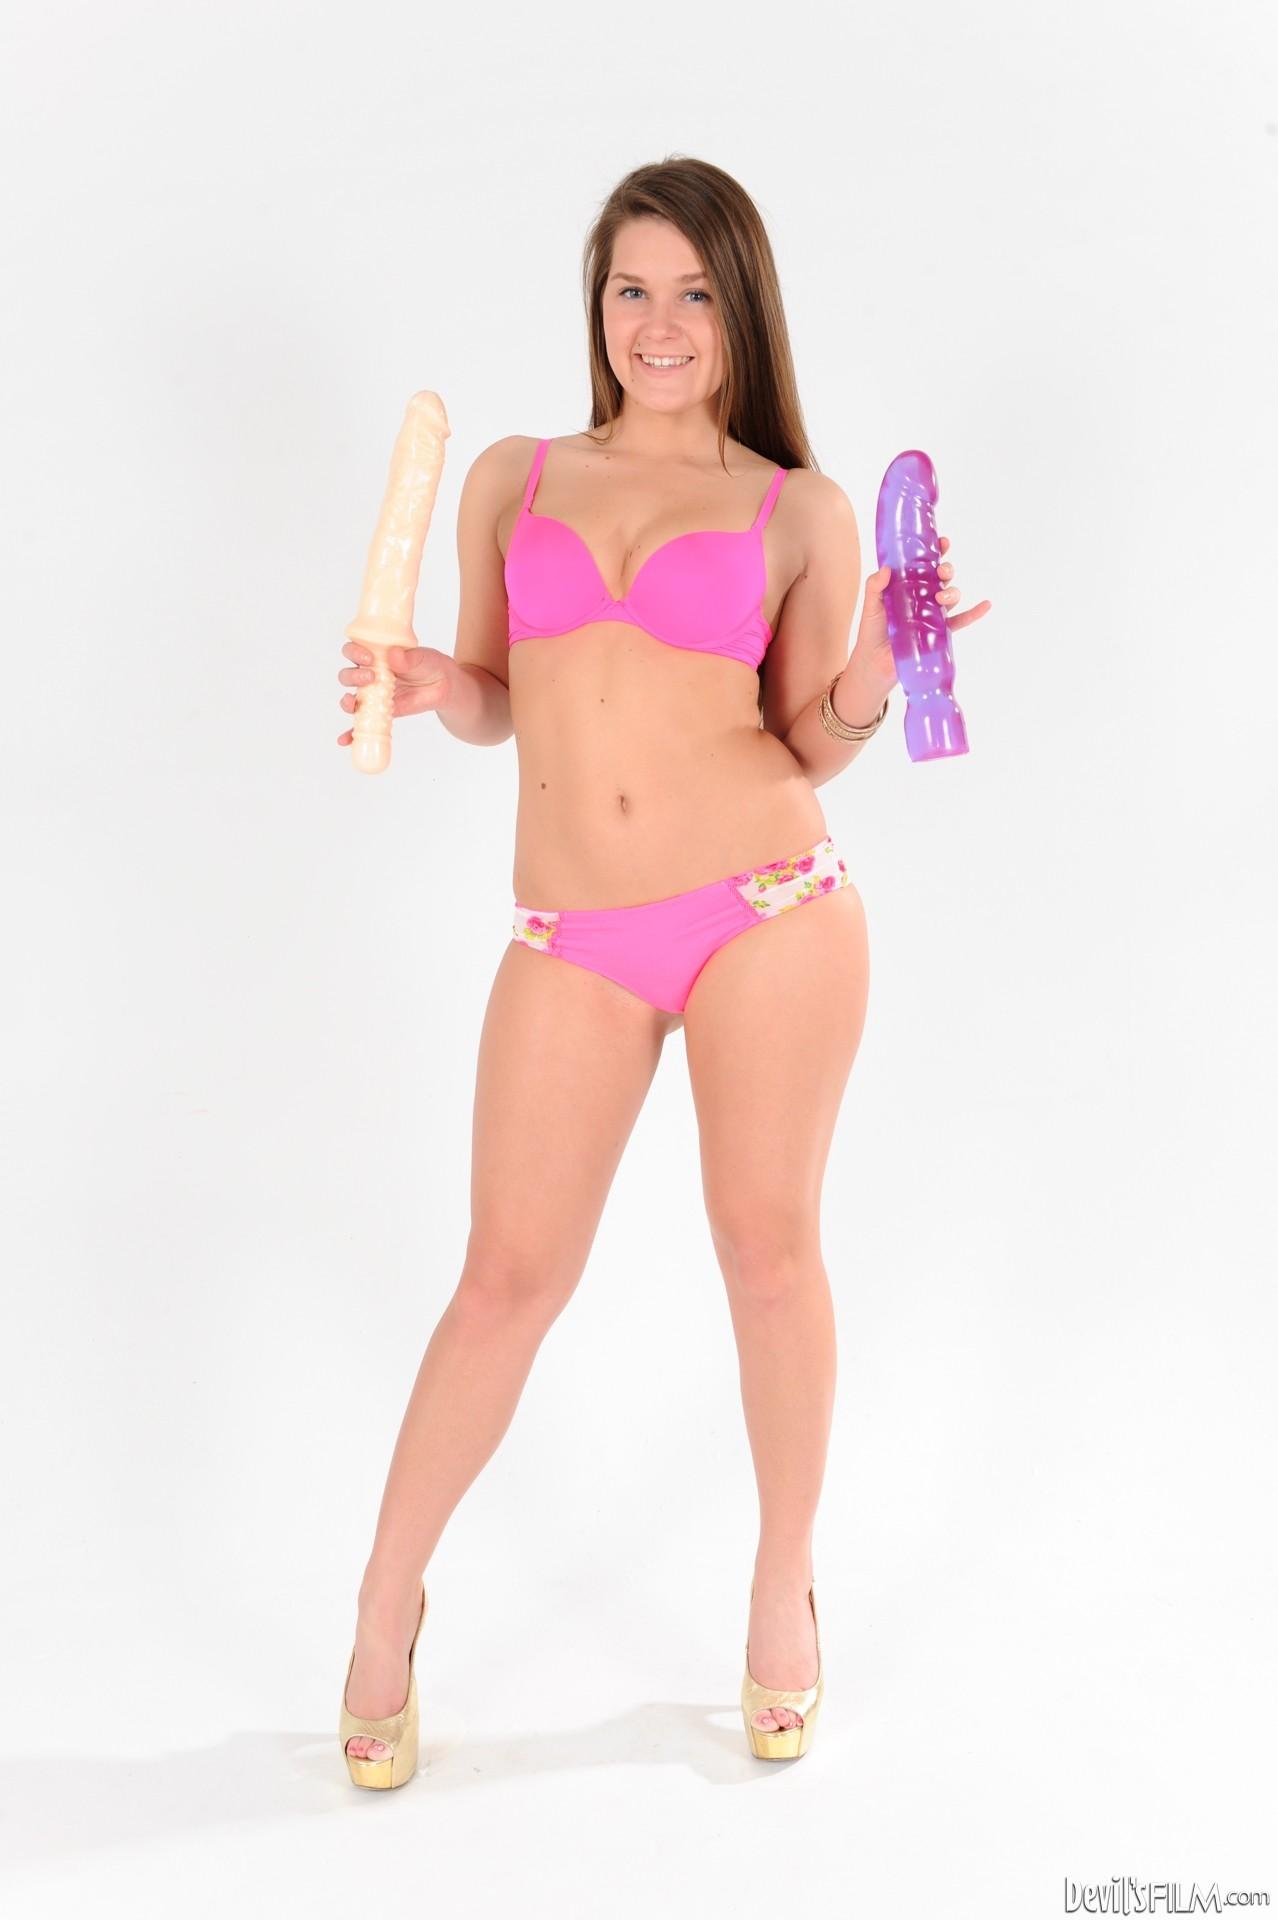 Abby Cross - My Gigantic Toys 17 70996-3438